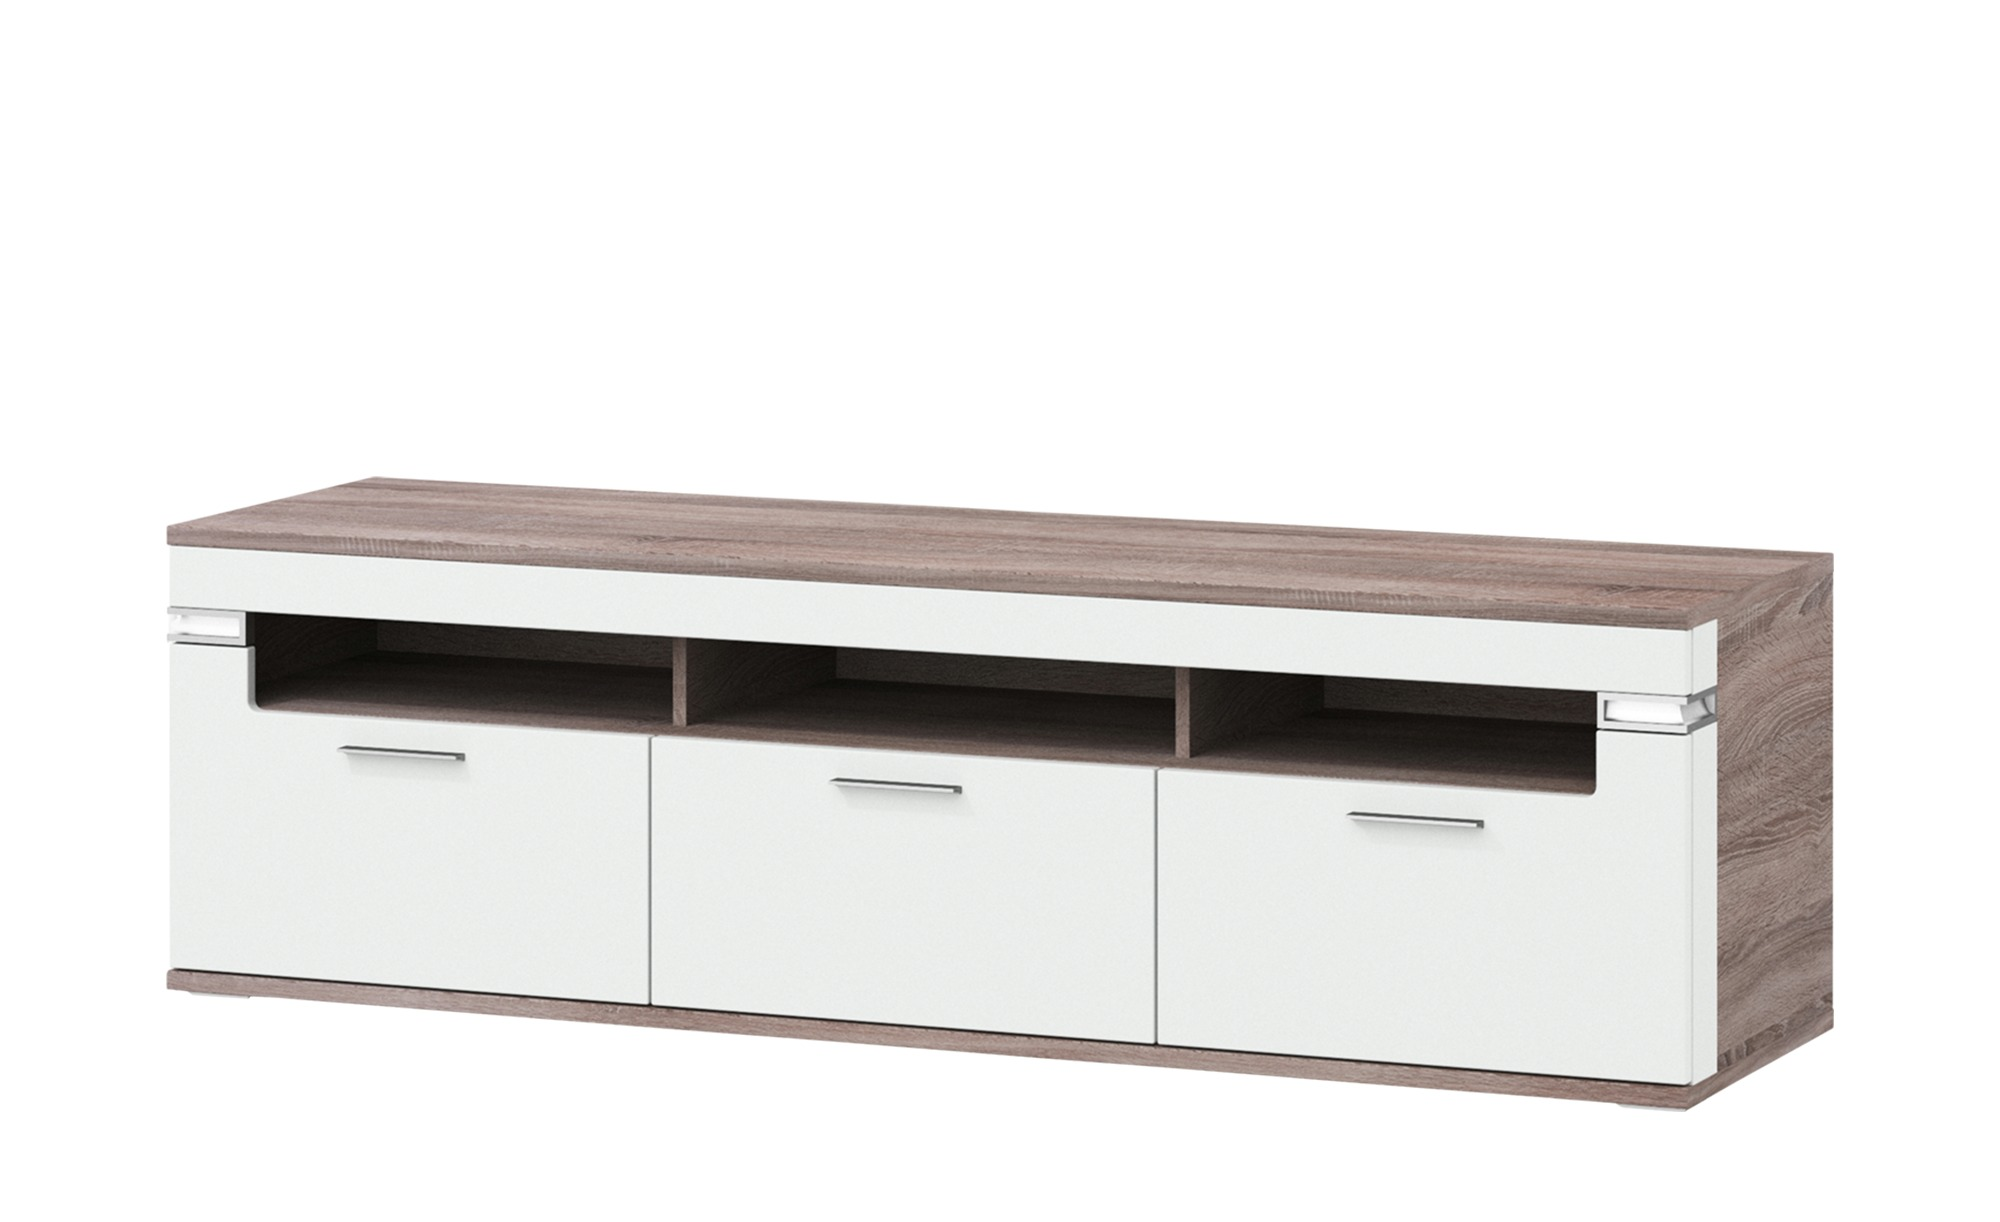 uno Lowboard  Katt ¦ weiß ¦ Maße (cm): B: 180 H: 53 T: 51 TV- & Media Möbel > TV-Racks - Höffner